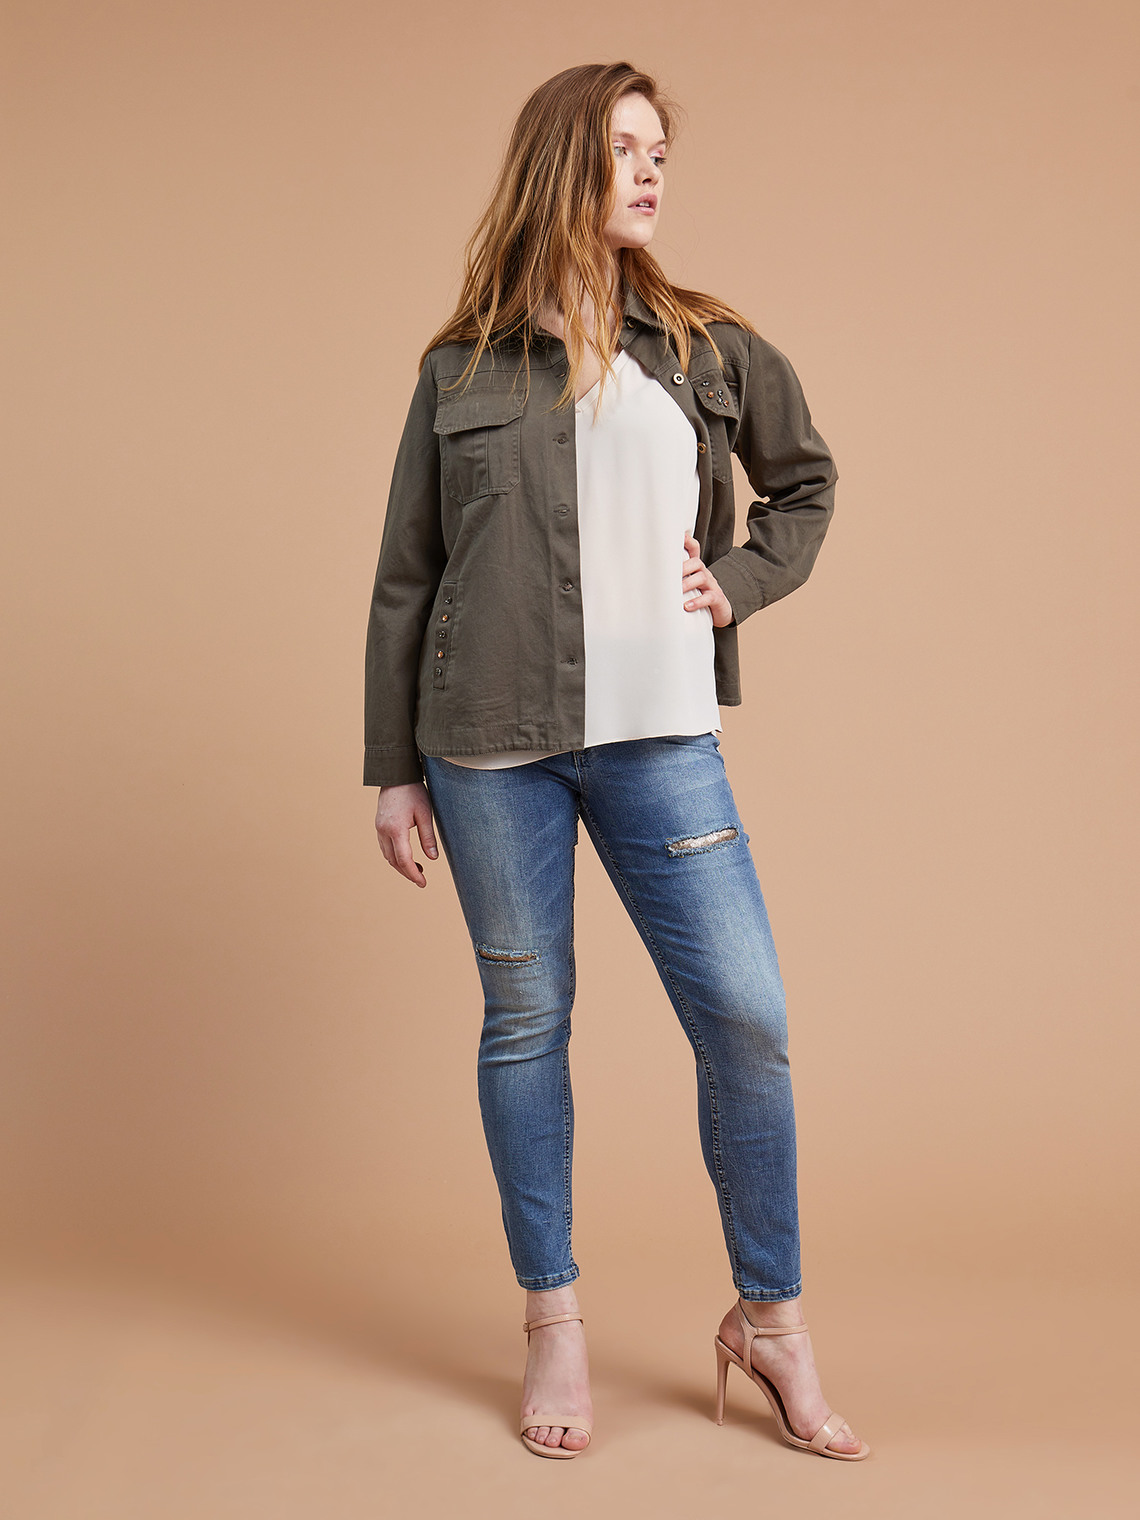 Skinny Skinny Jeans Skinny Donna Jeans Jeans Donna Fiorellarubino Fiorellarubino orxeWdBC